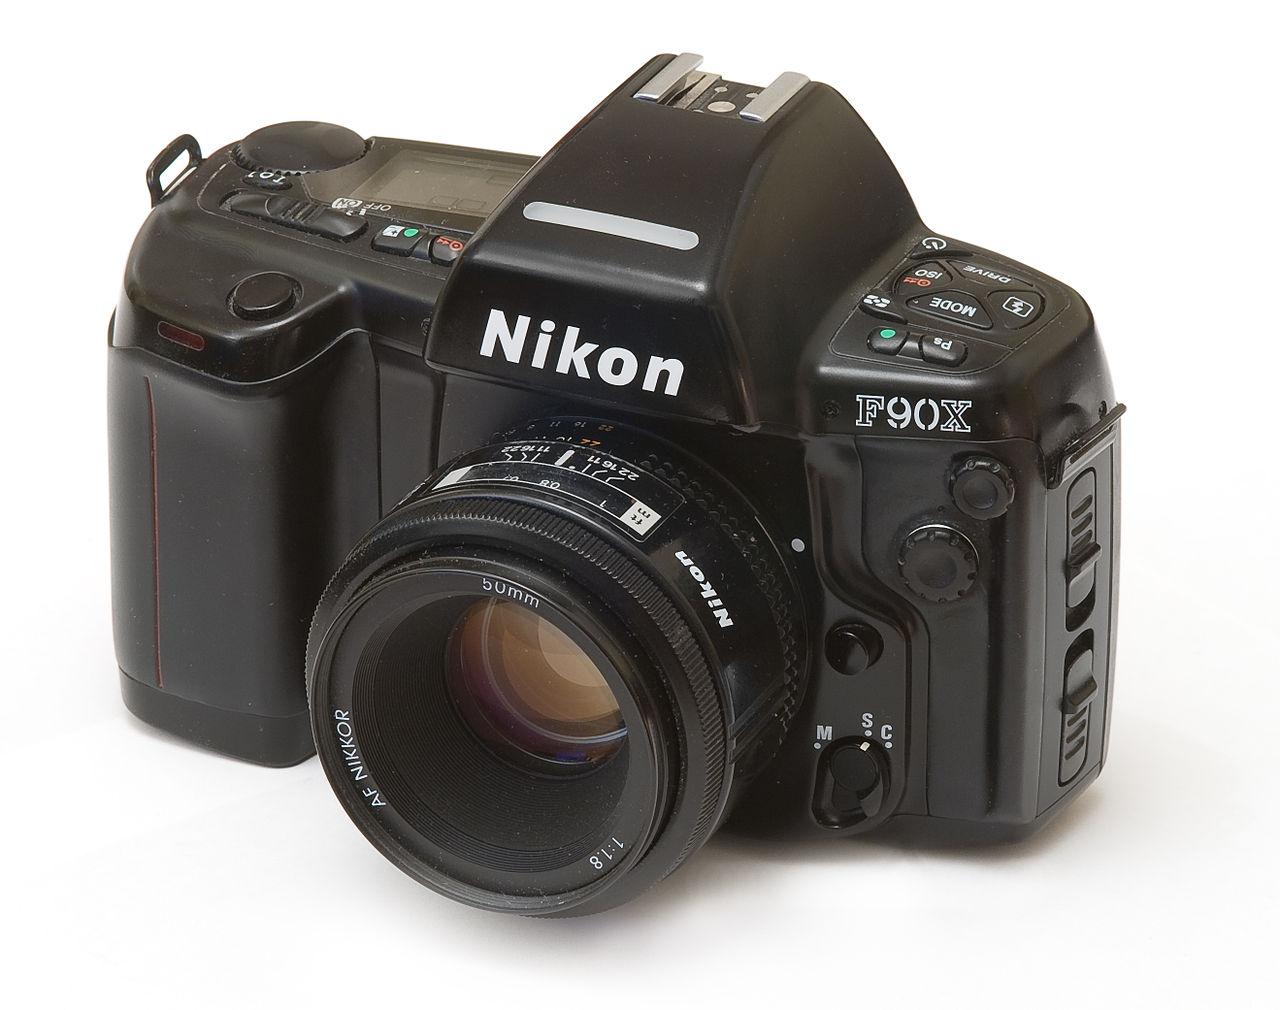 Nikon F90X (Pic: Amydet/Wikimedia Commons)